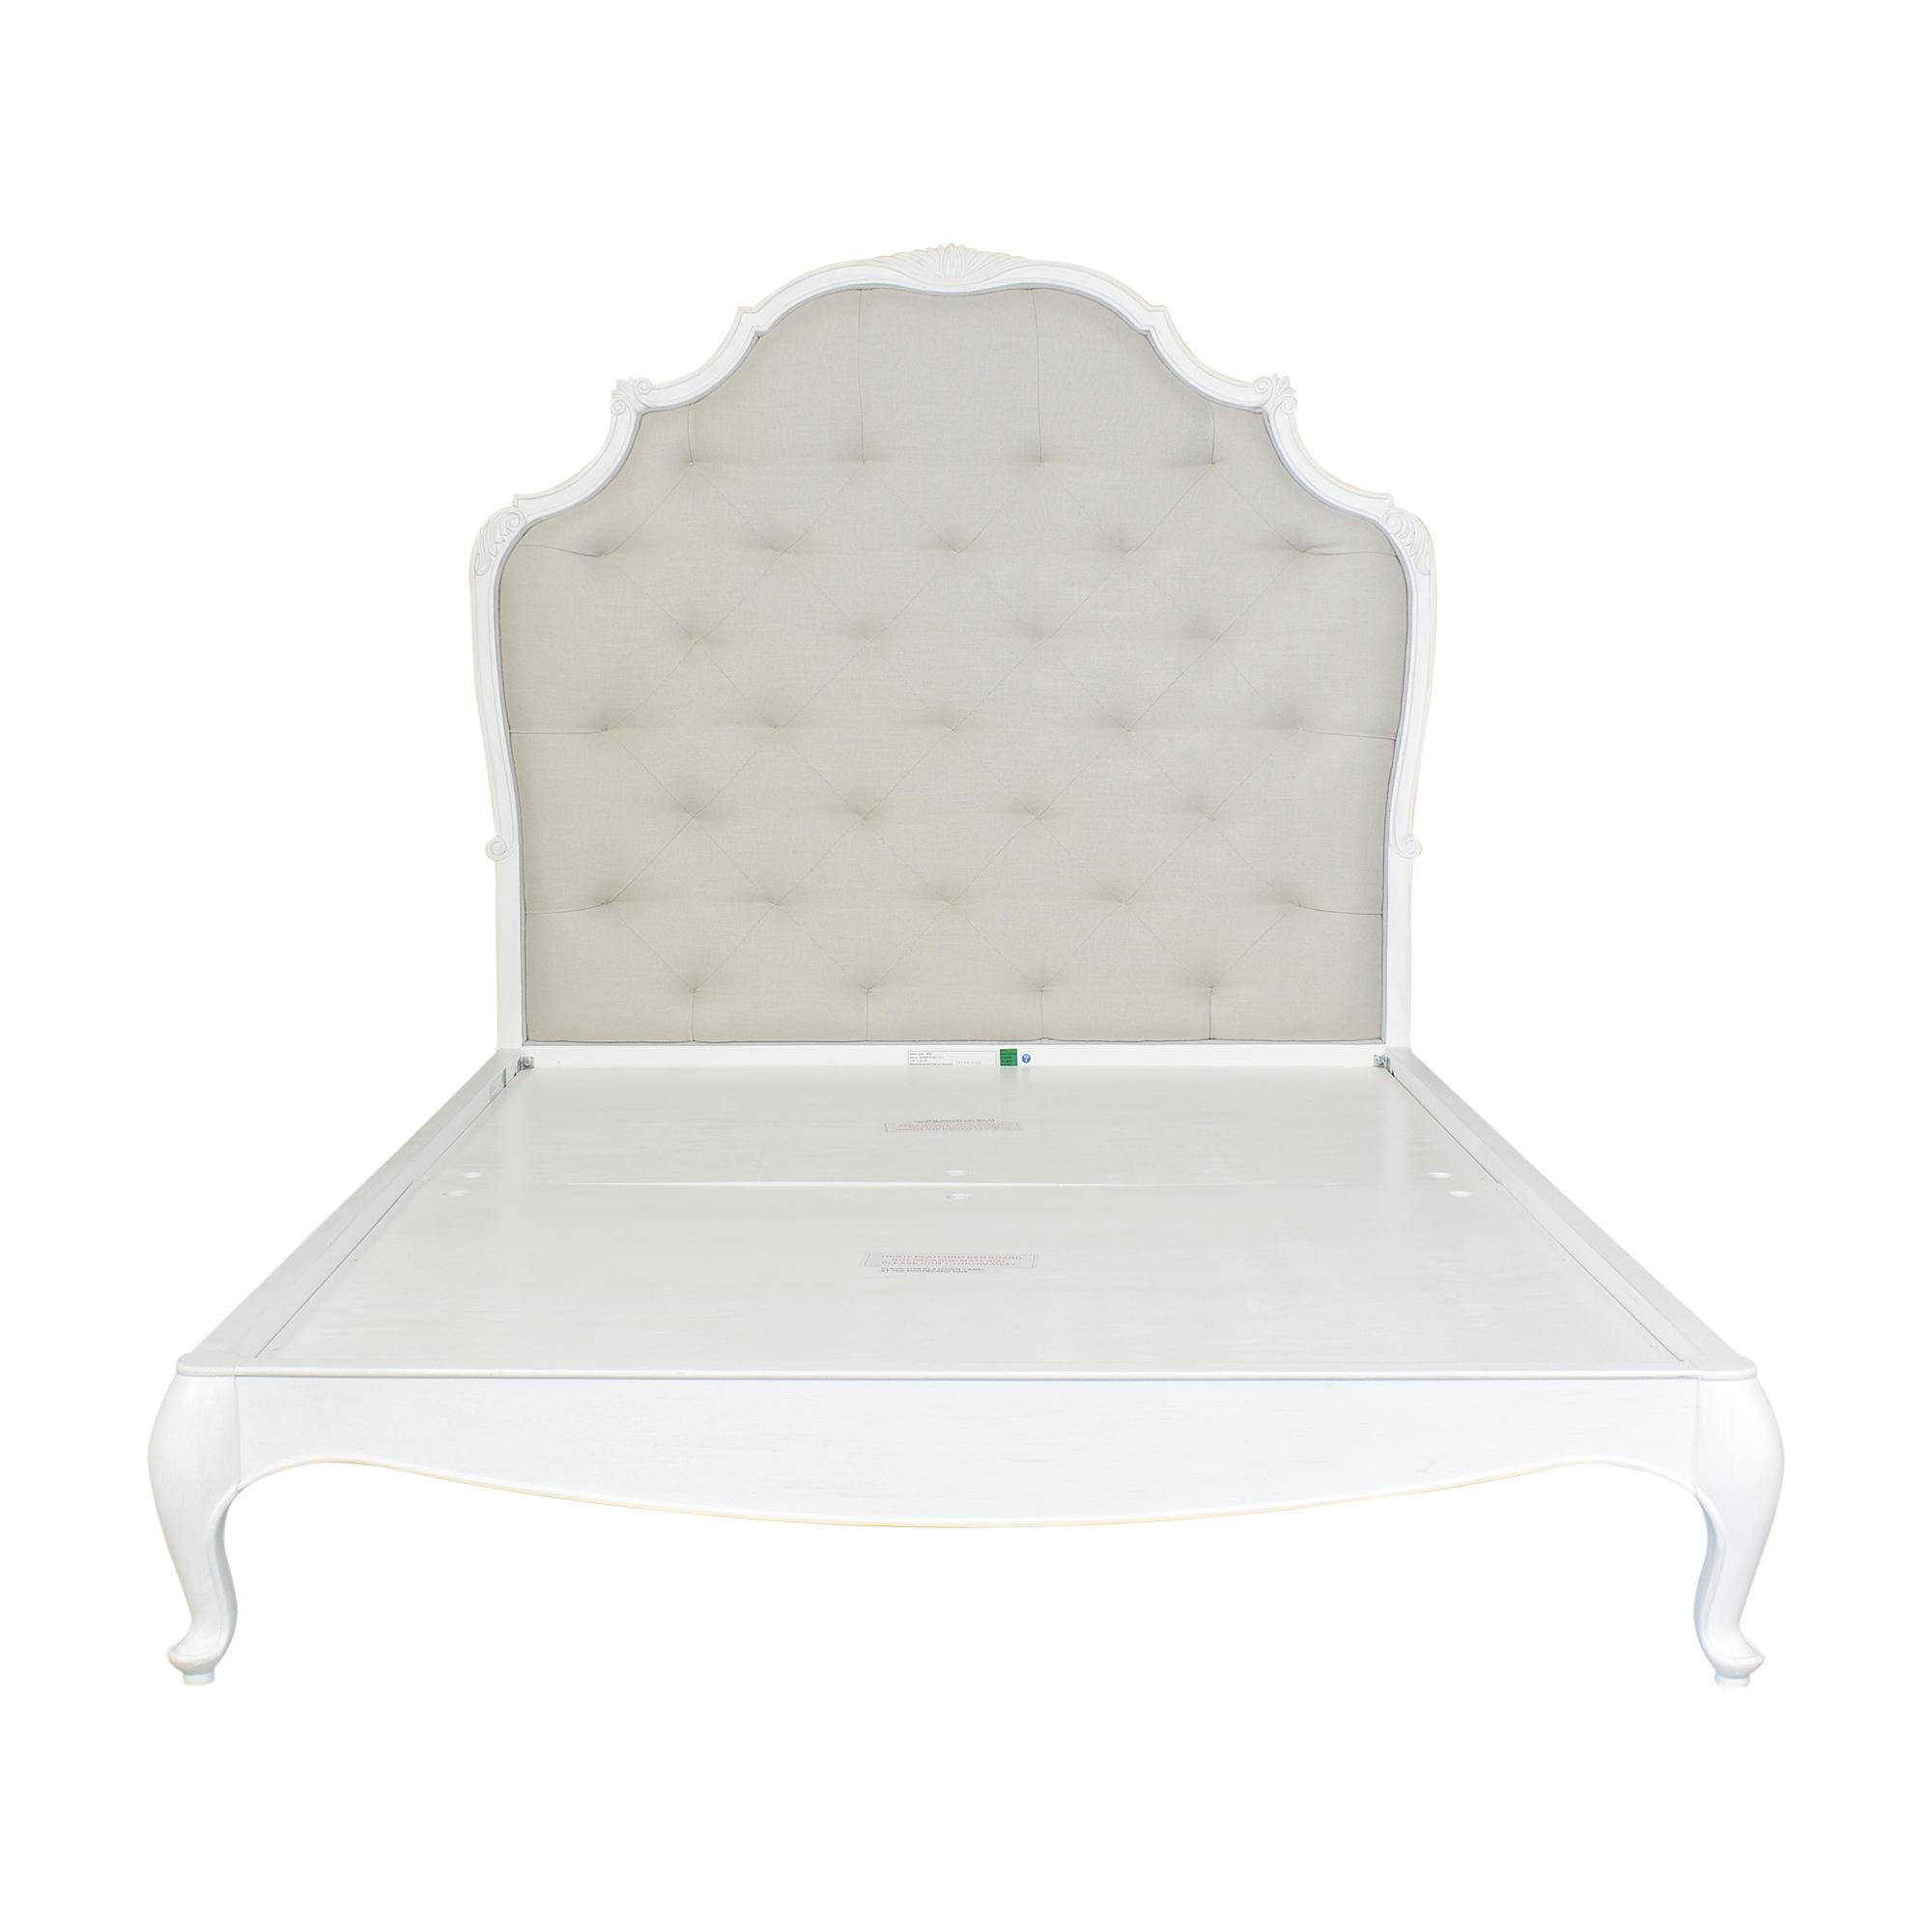 Restoration Hardware RH Teen Paulette Tufted Full Bed discount